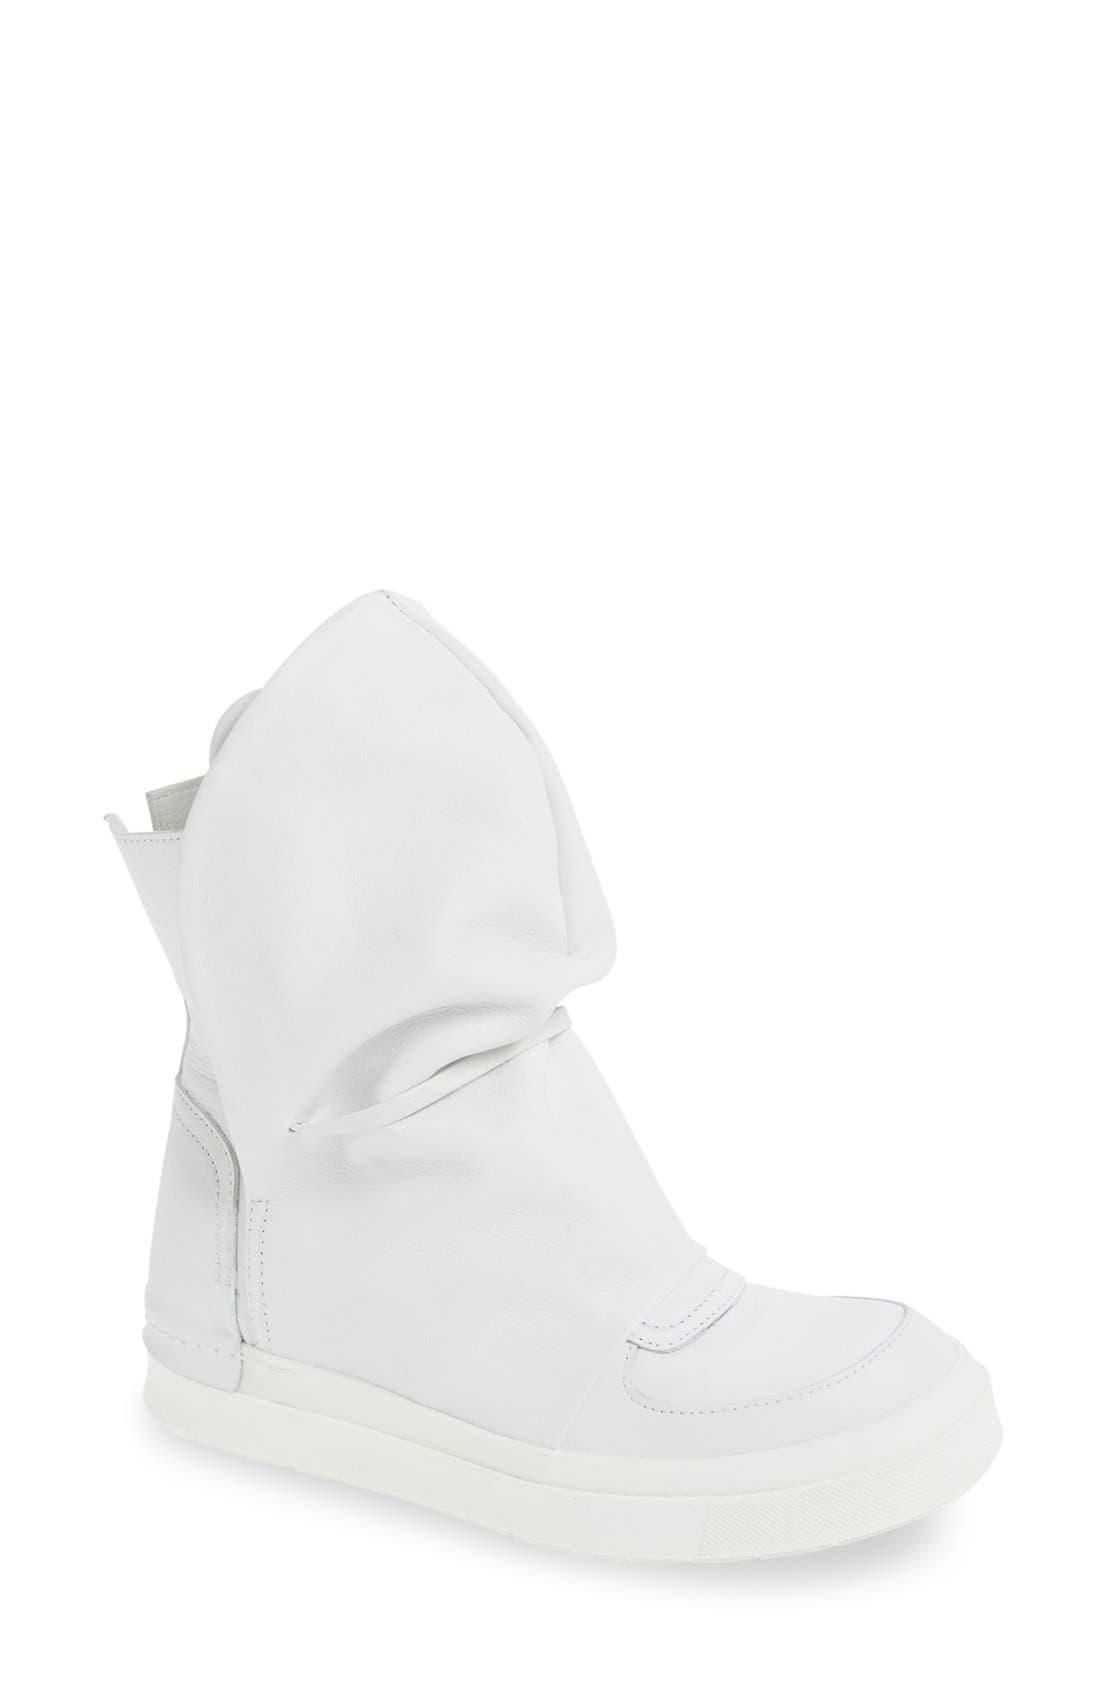 Alternate Image 1 Selected - CA by CINZIA ARAIA Hidden Wedge Sneaker Boot (Women)